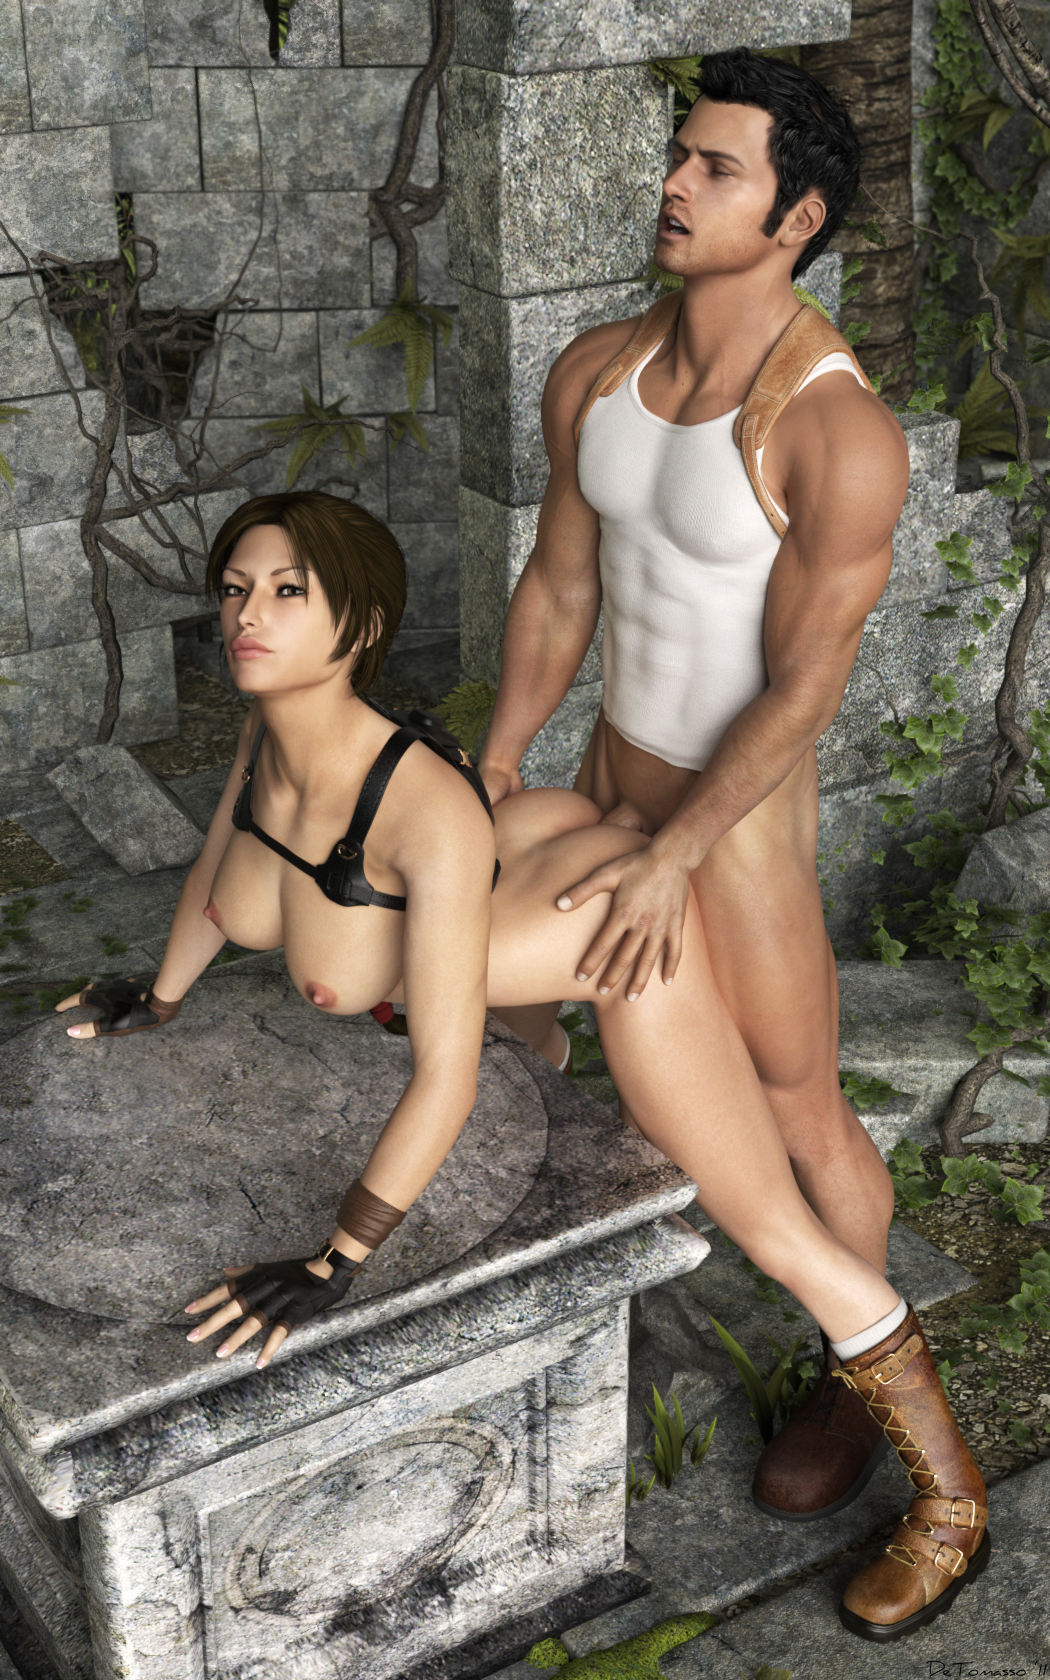 Lara croftporn hentai sex movie